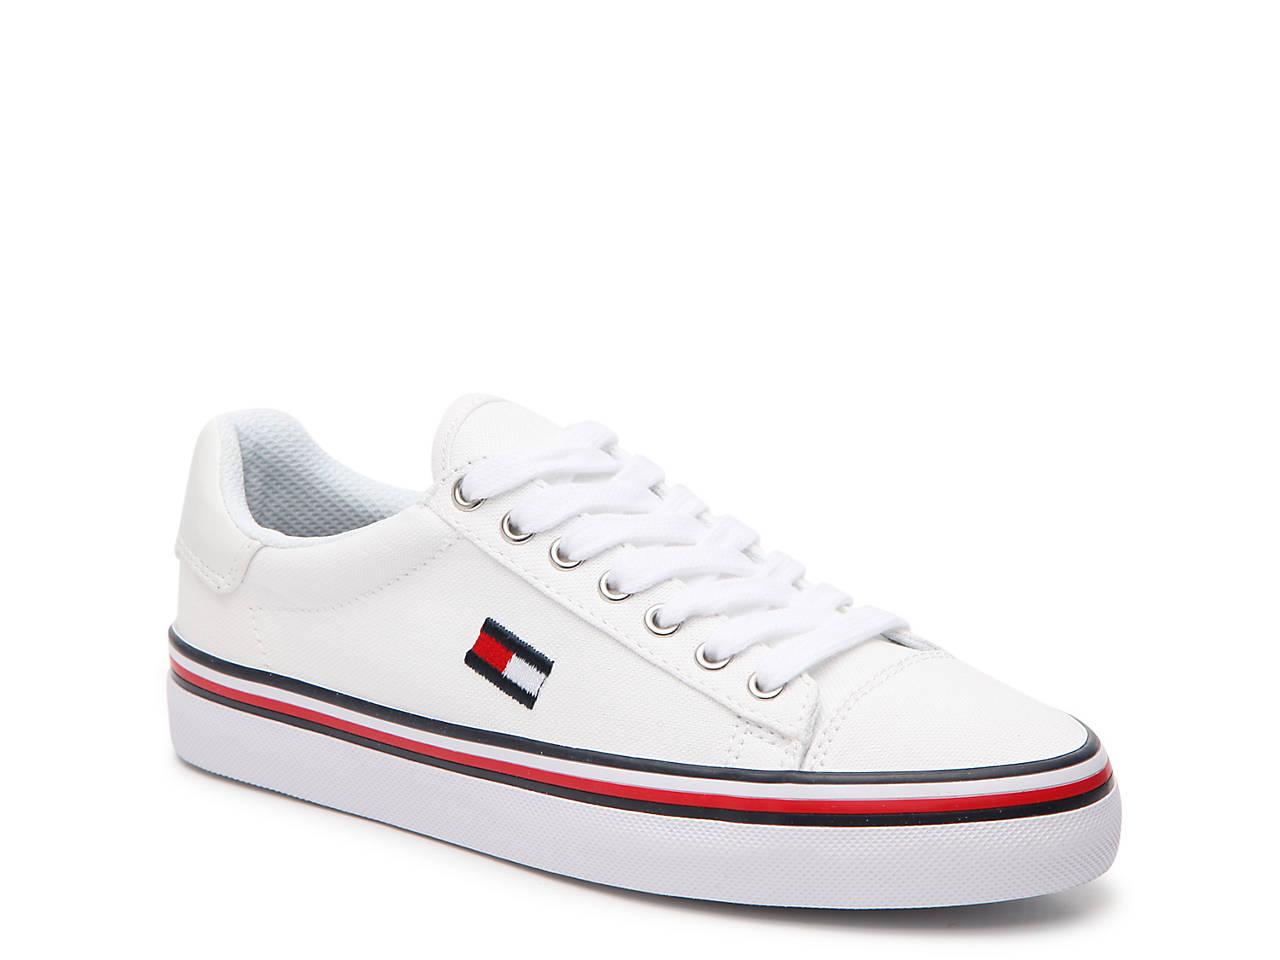 6b8640c2b1a59d Tommy Hilfiger Fressian Sneaker Women s Shoes